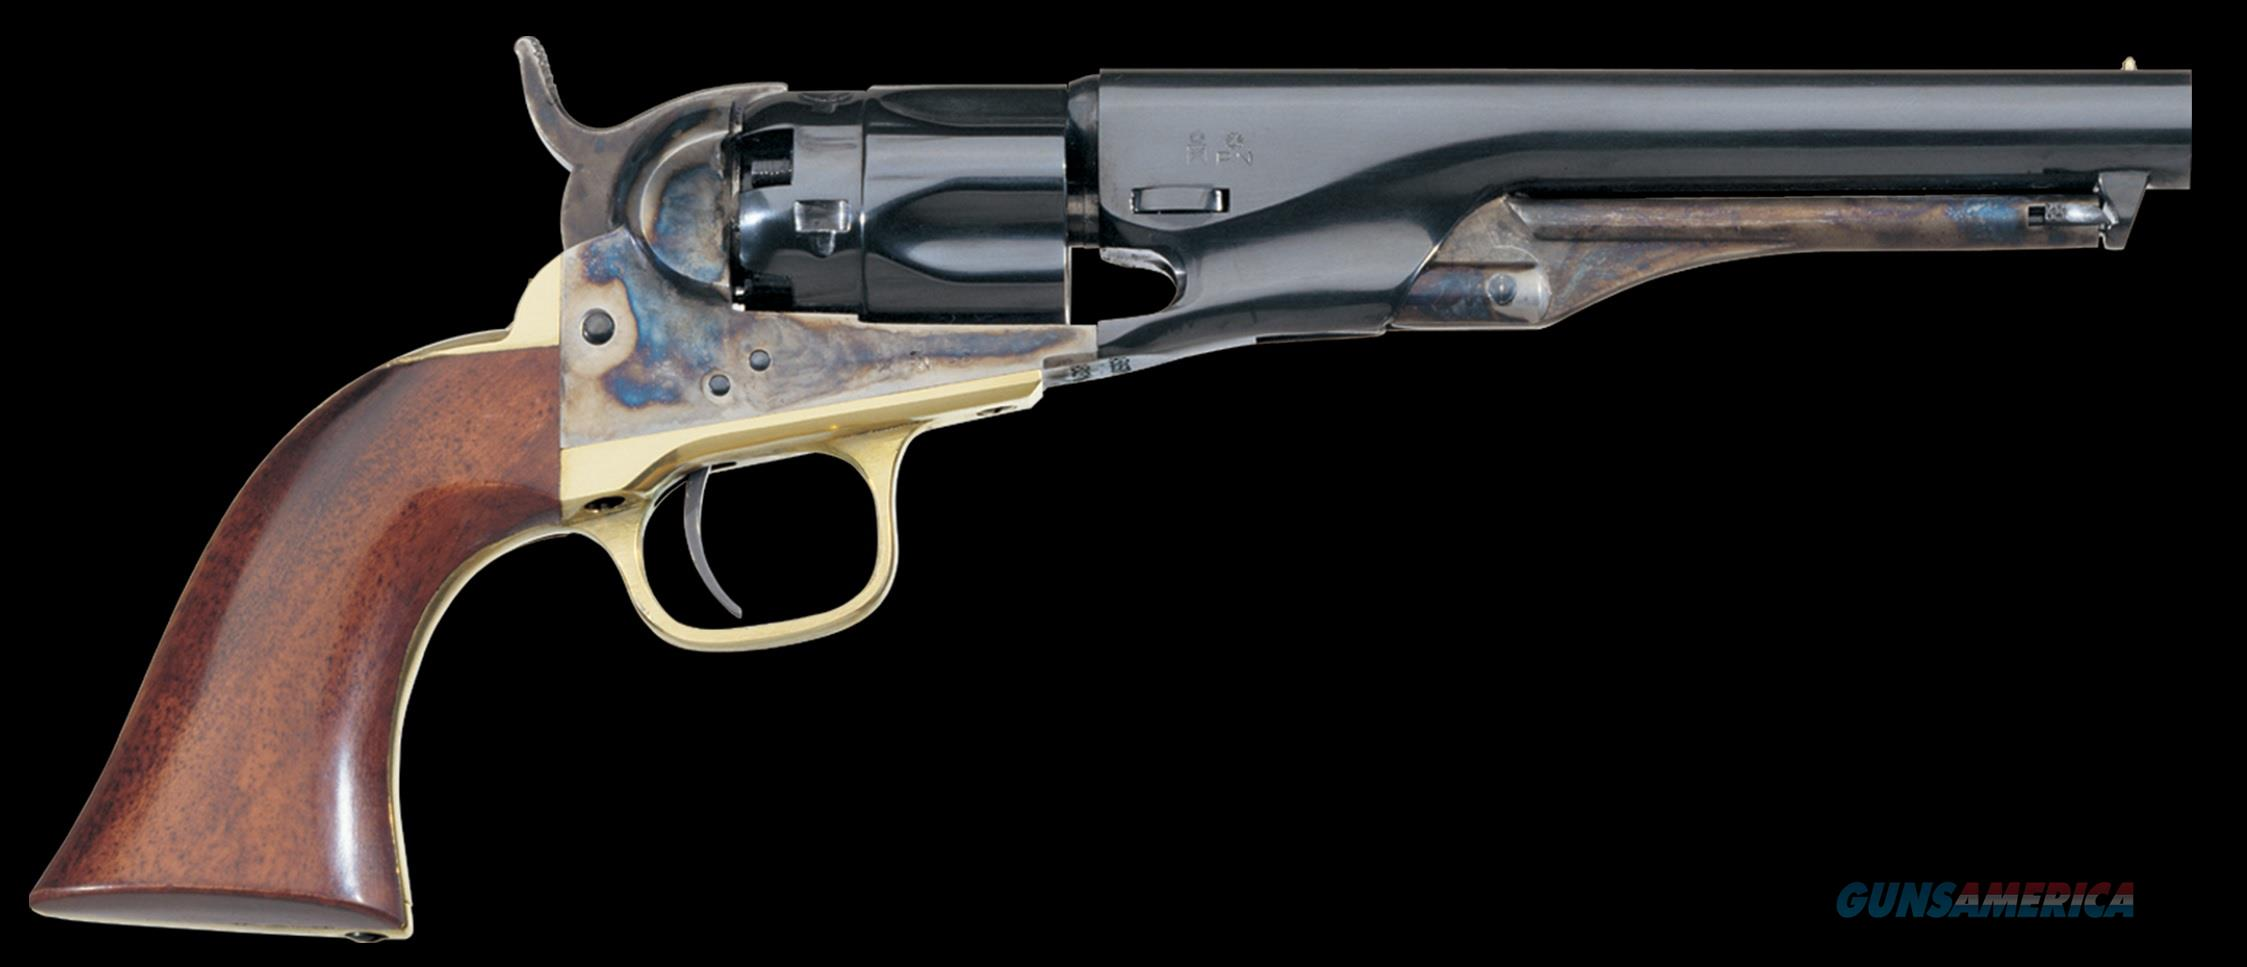 Uberti 1862 Police Revolver (340710)  Non-Guns > Black Powder Cartridge